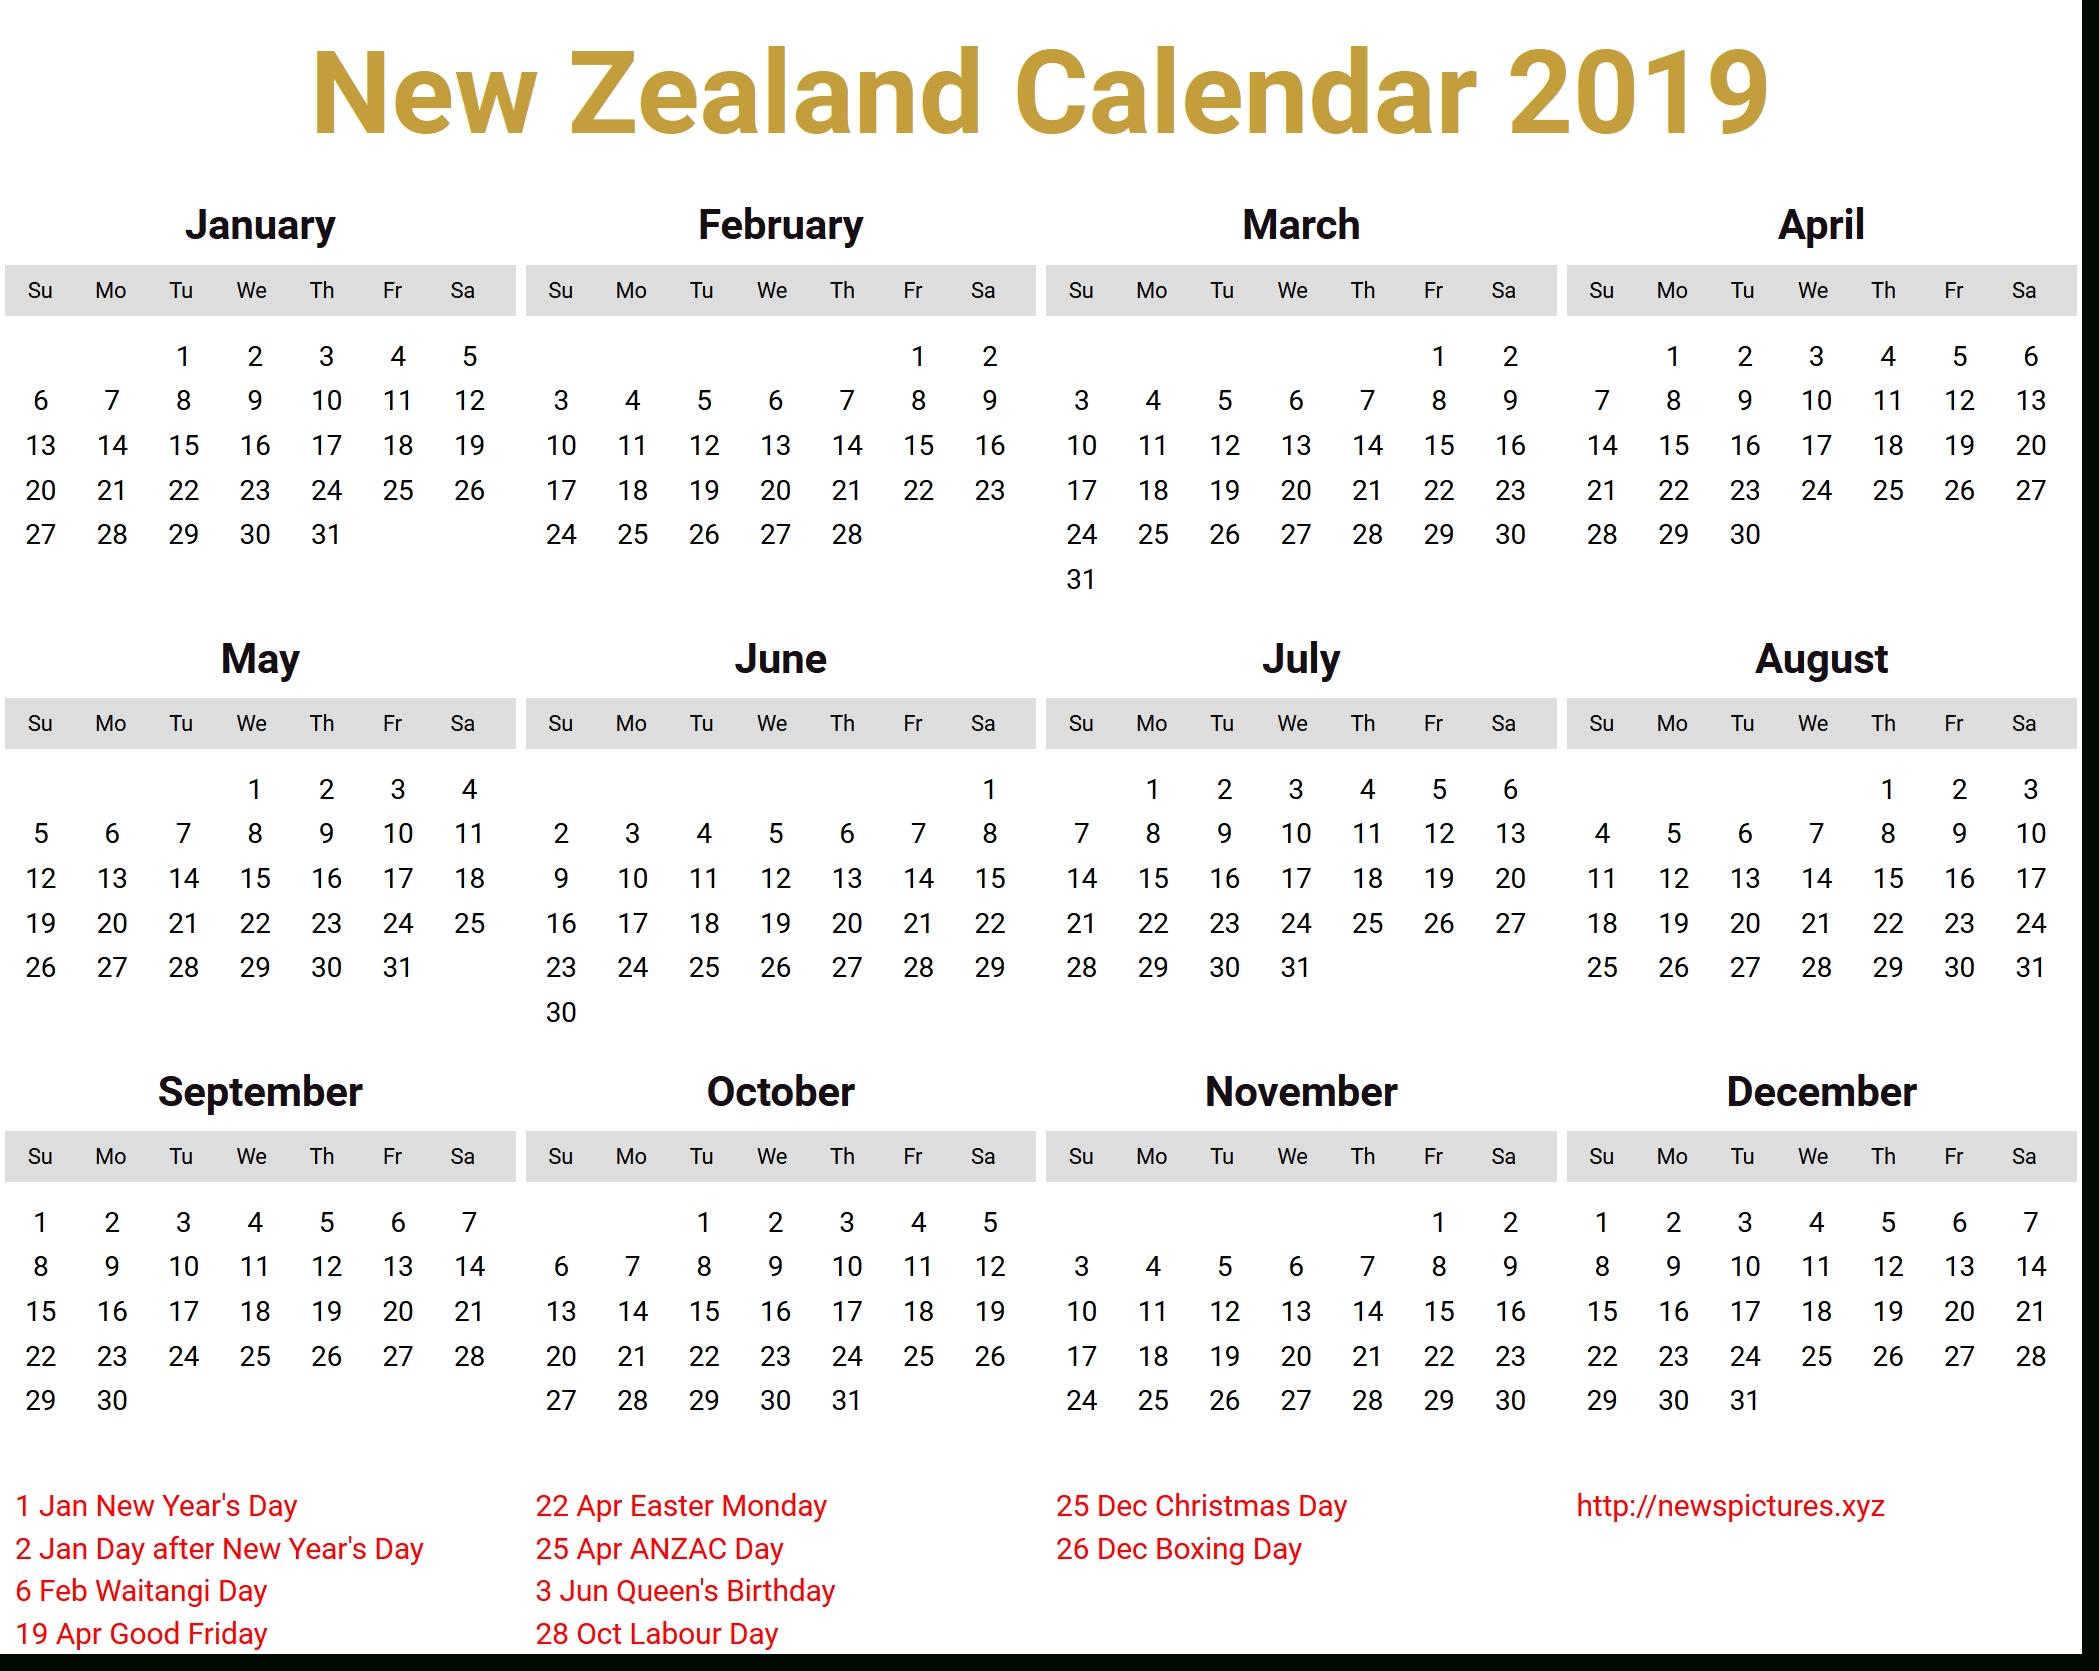 Image For New Zealand Calendar 2019 Download | Holiday-School Holidays Nz Calendar